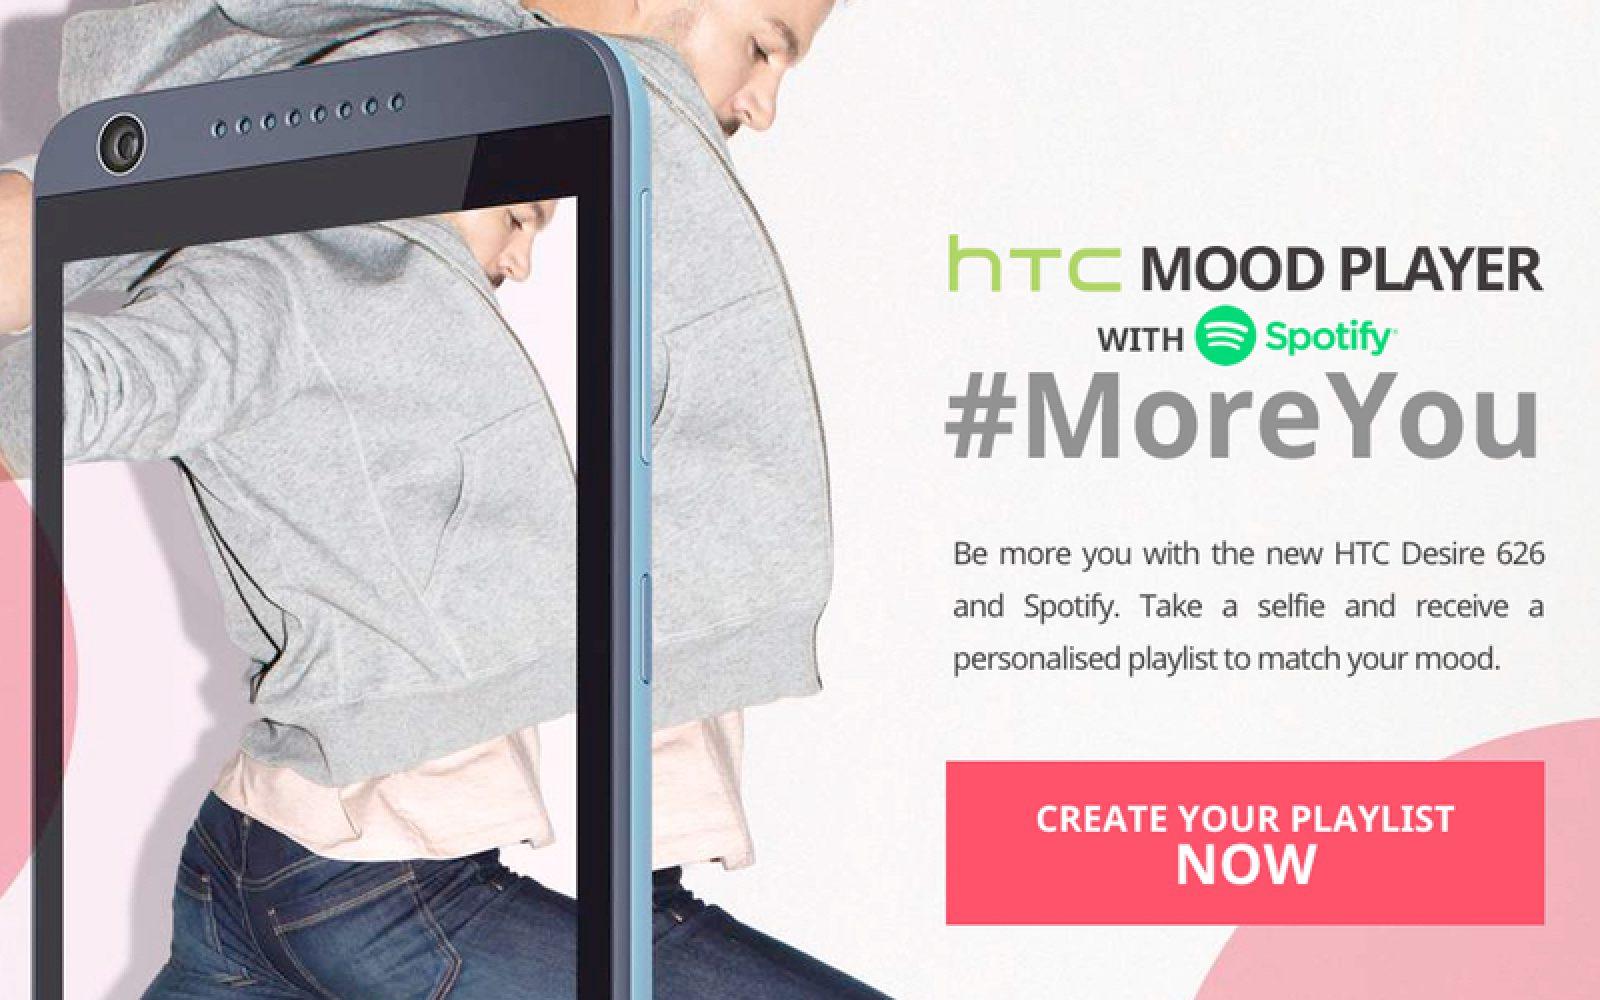 HTC Mood Player lets you create a custom Spotify playlist